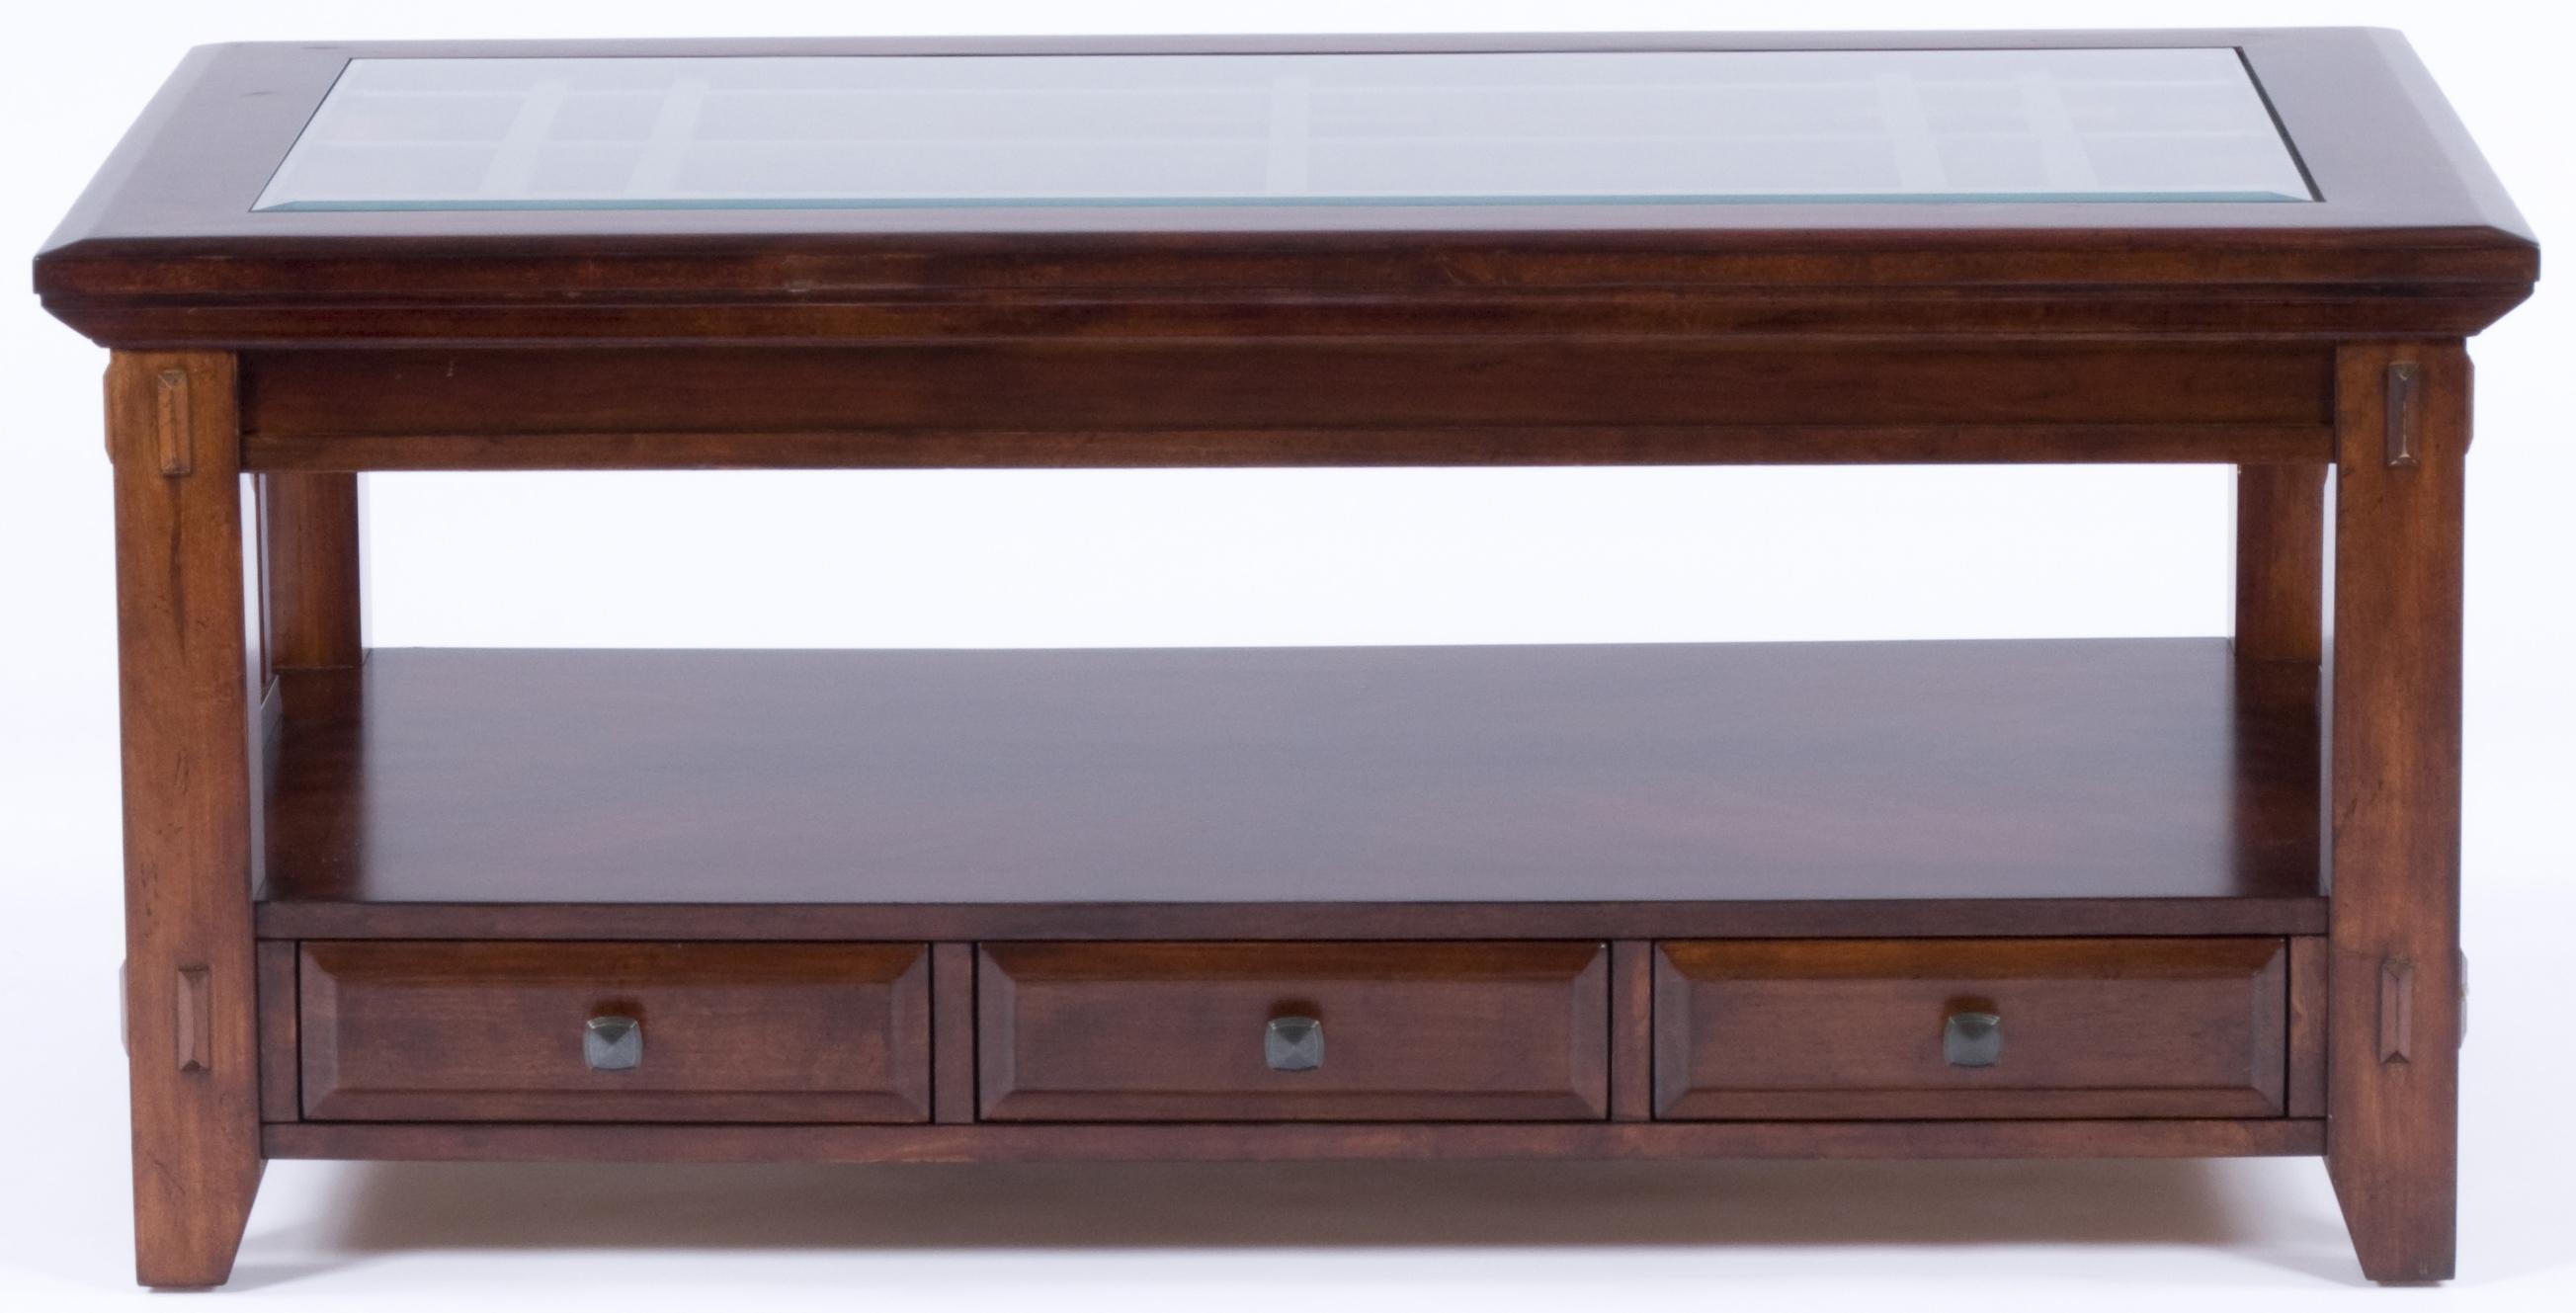 Broyhill Furniture Vantana Rectangular Cocktail Table - Item Number: 4985-001